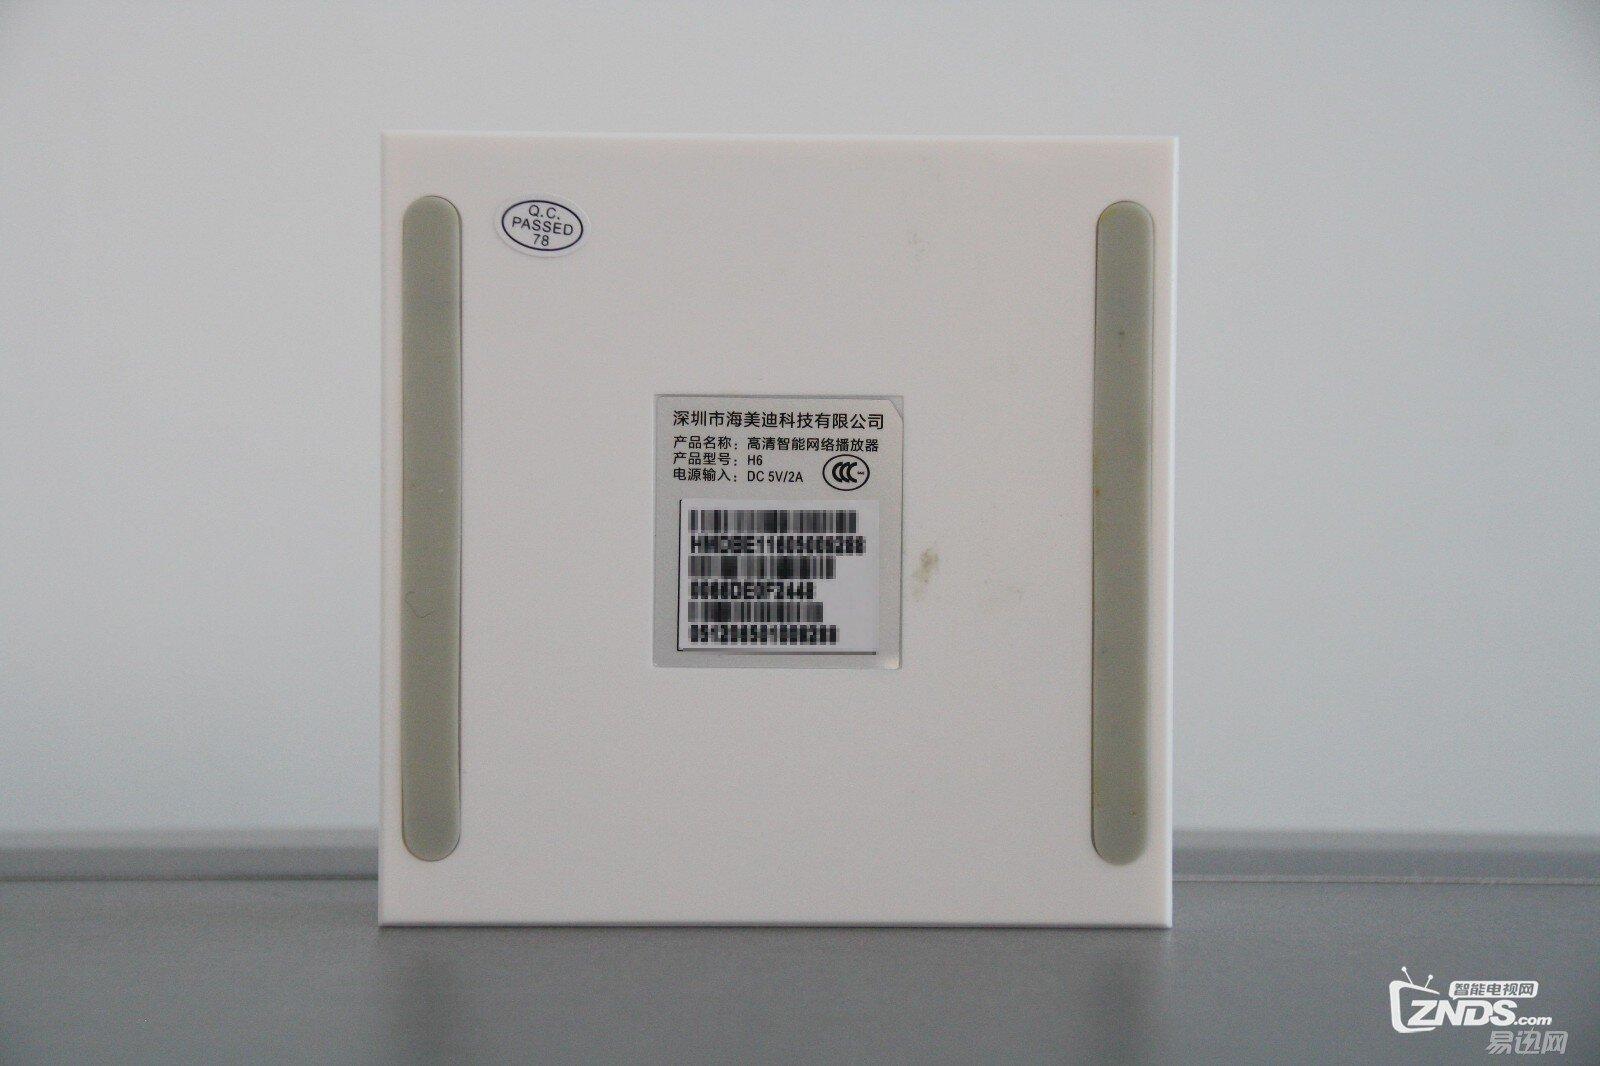 57c01571Nc0a7cc60.jpg